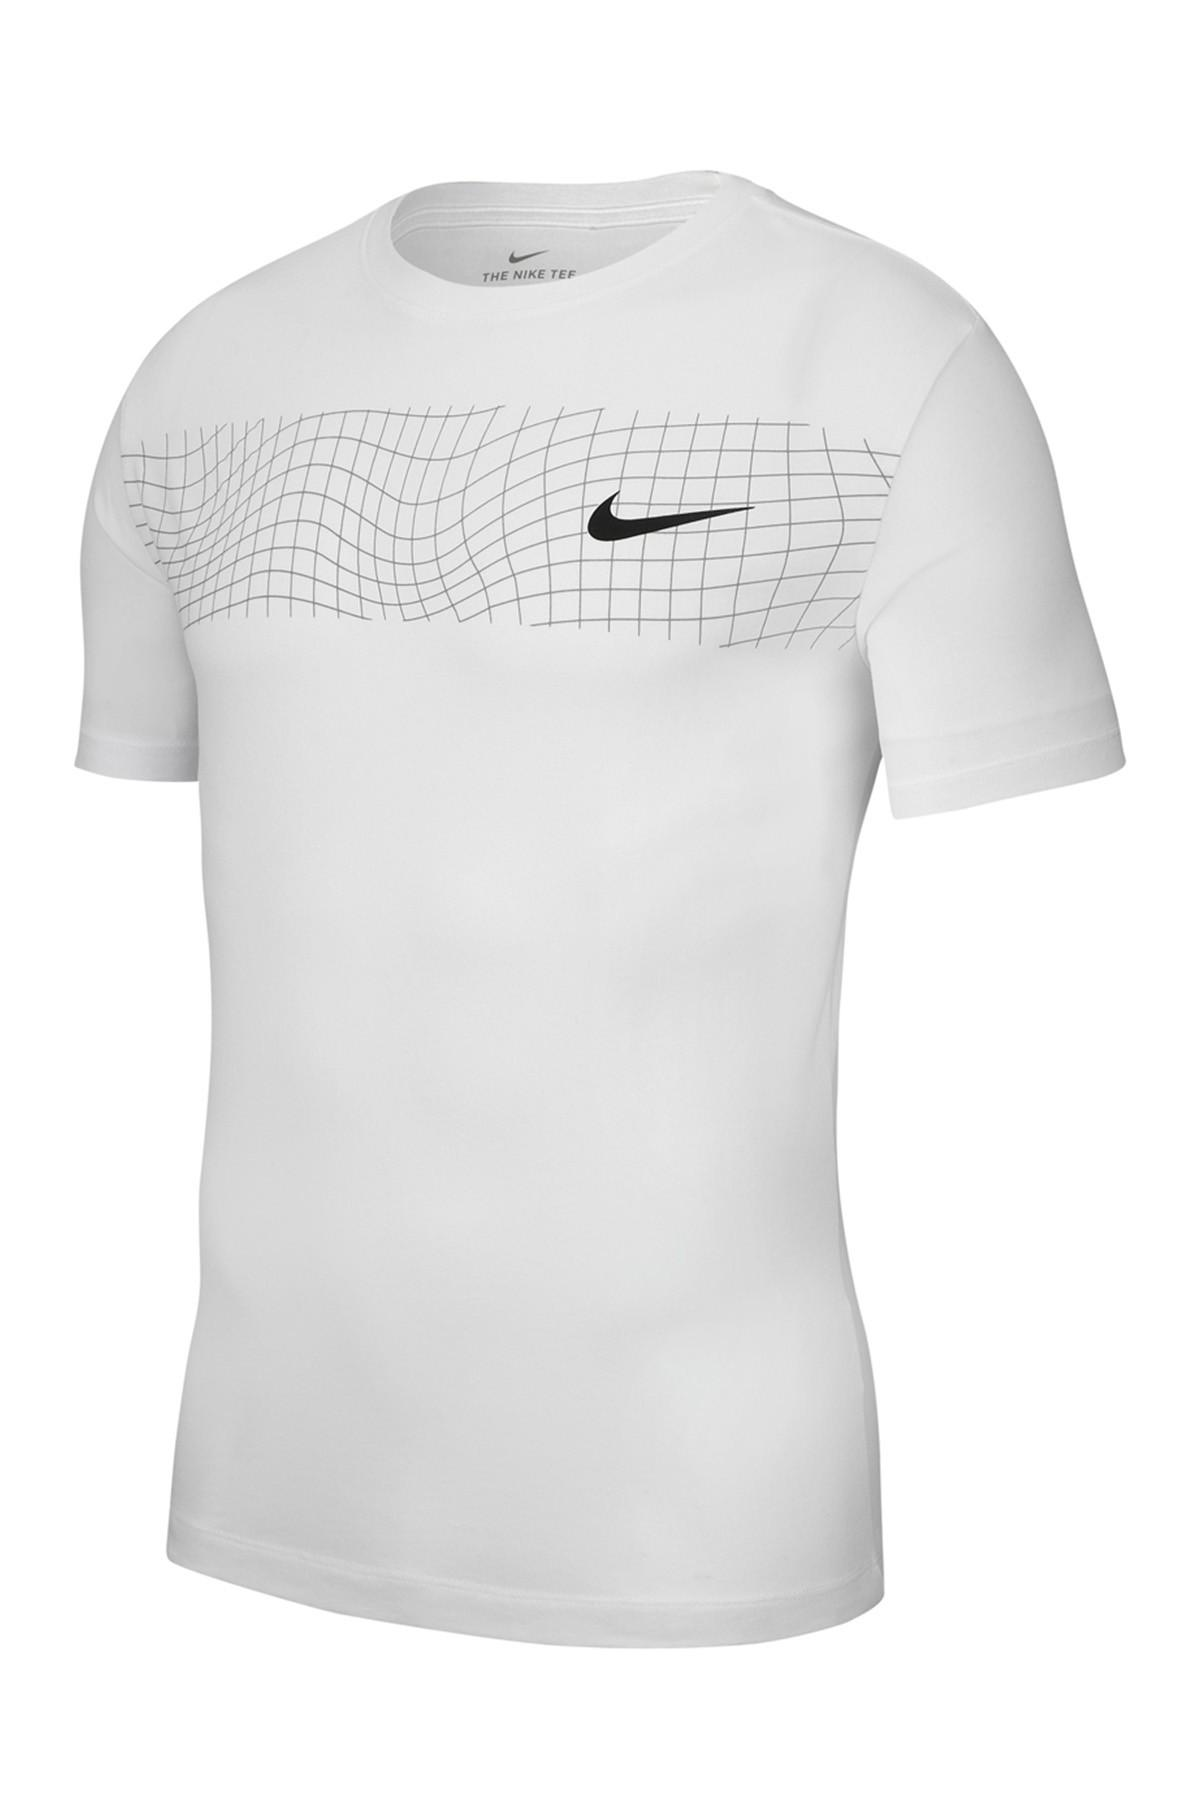 edcab46ed17 Lyst - Nike Grid Graphic Crew Tee in White for Men